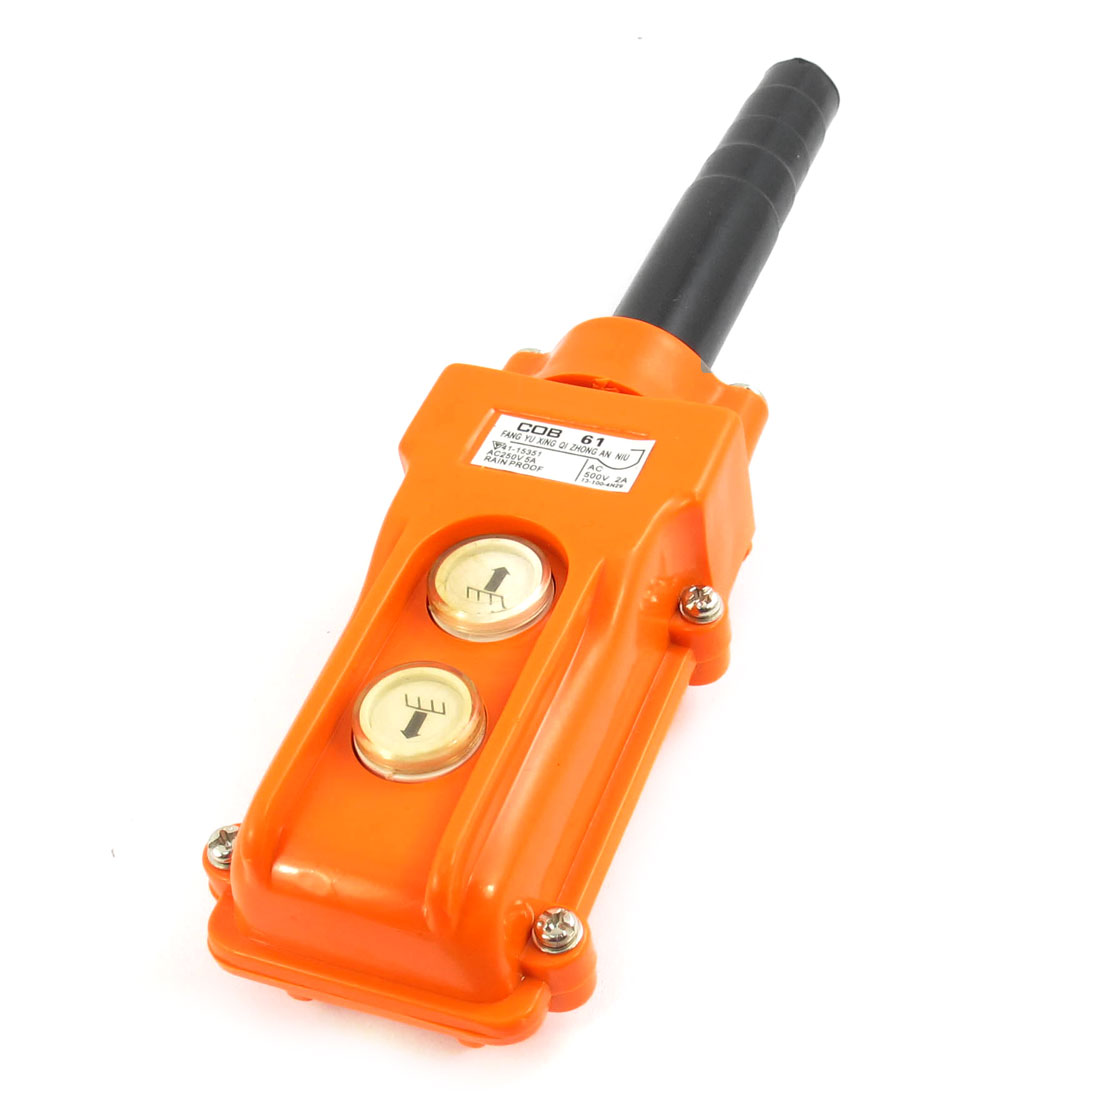 COB61 2-Way 2-Button Control Rainproof Pushbutton Switch AC 500V 2A for Hoist Crane